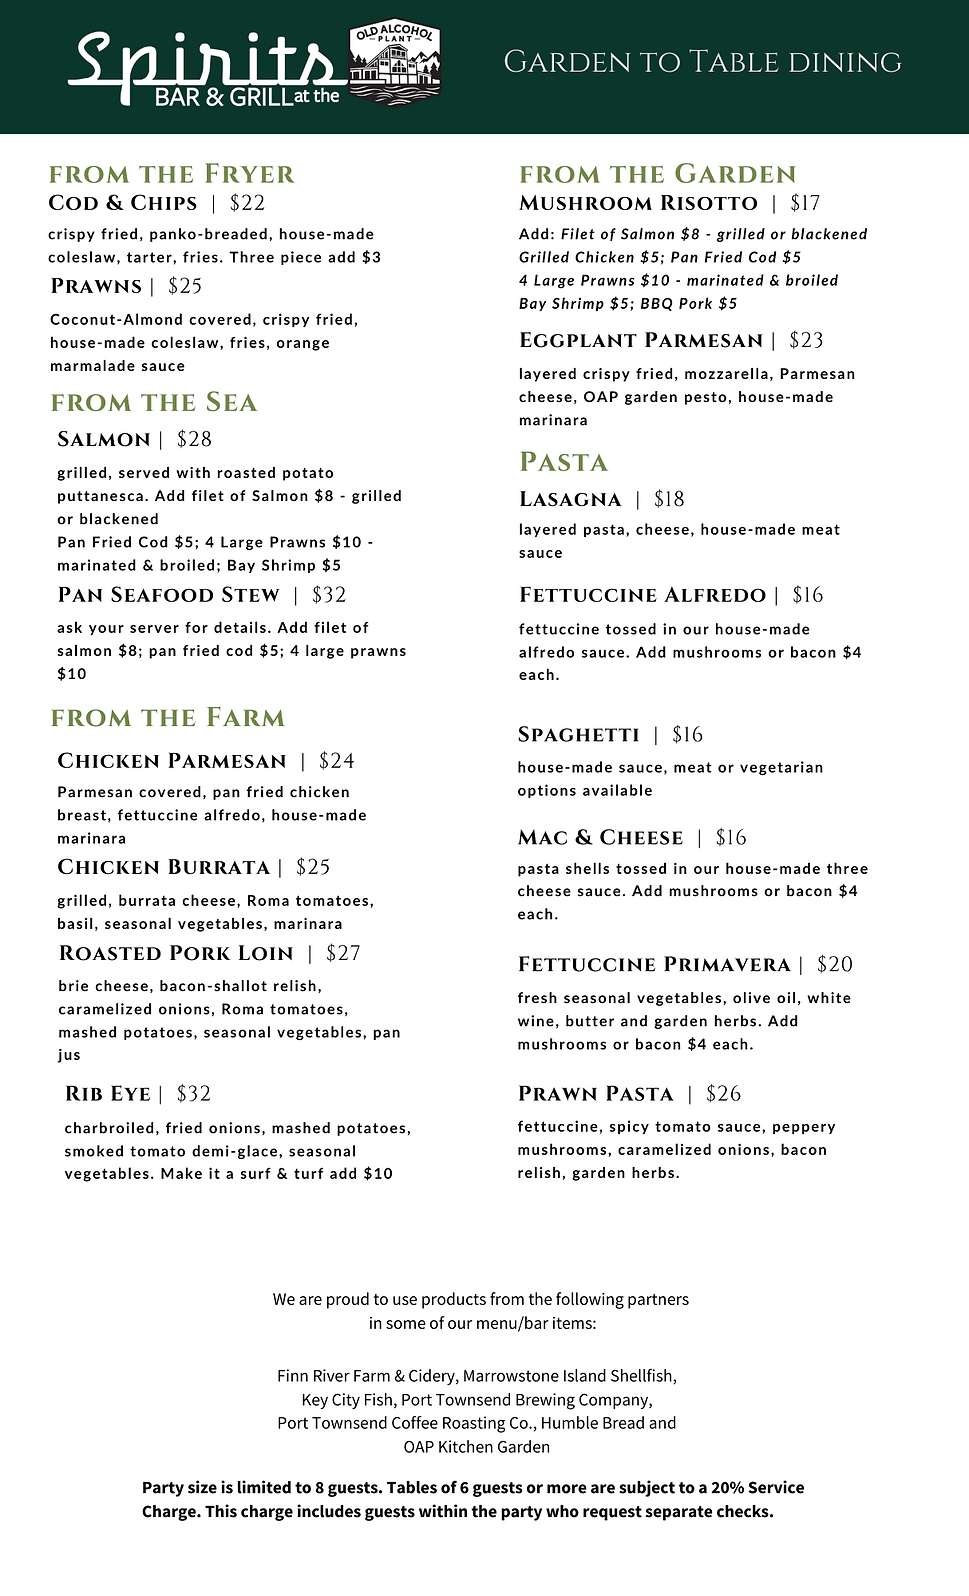 dinner menu 62021 (2).png